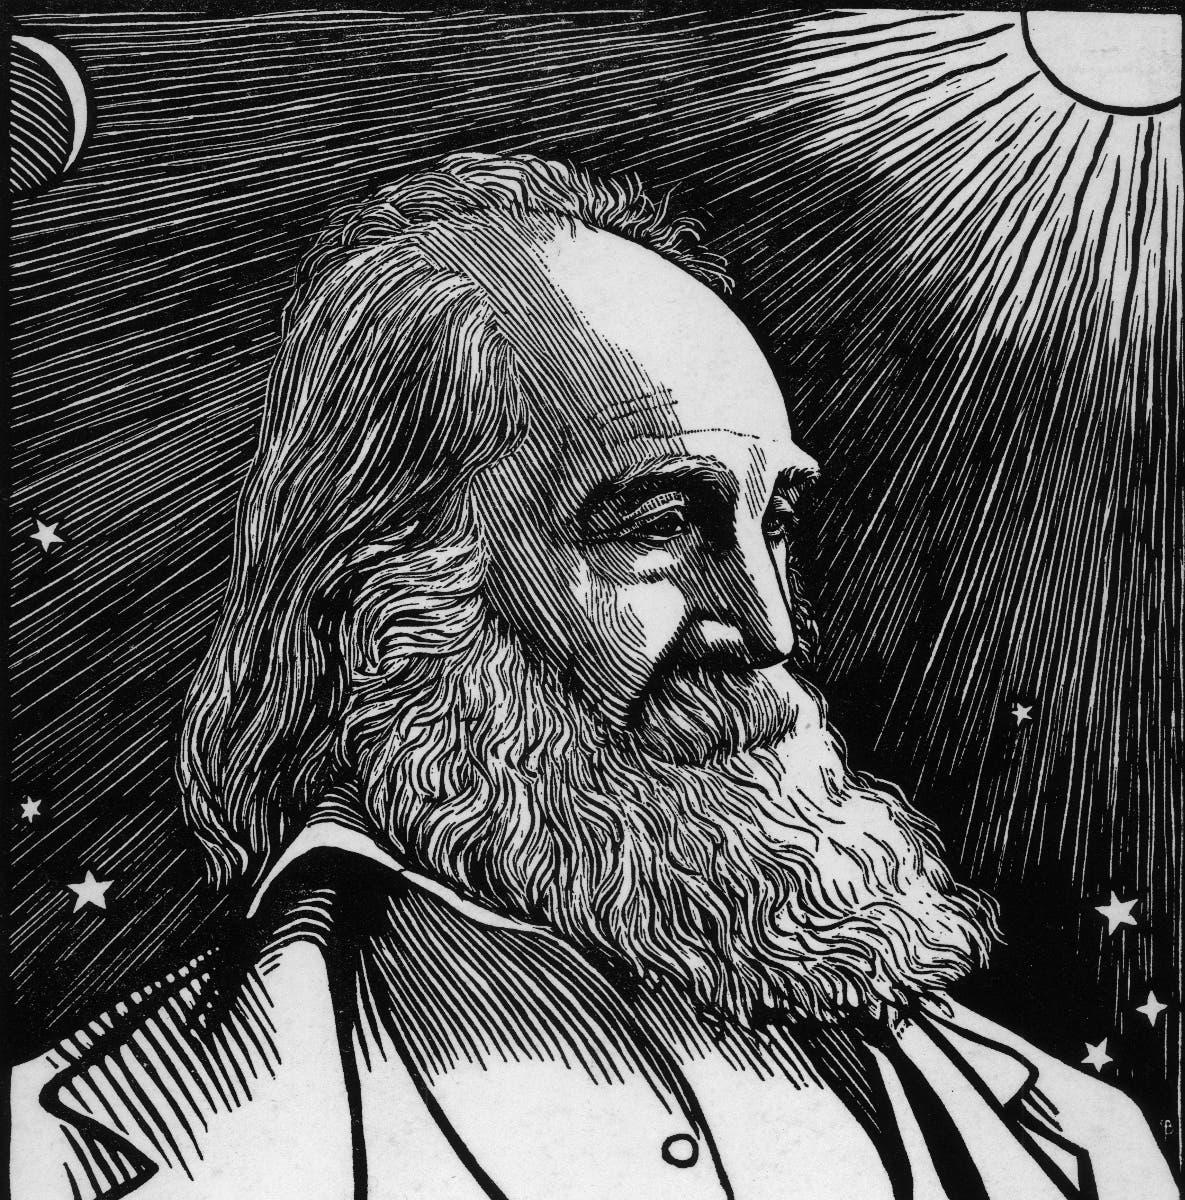 Fort Greene Park To Host Walt Whitman Beard And Mustache